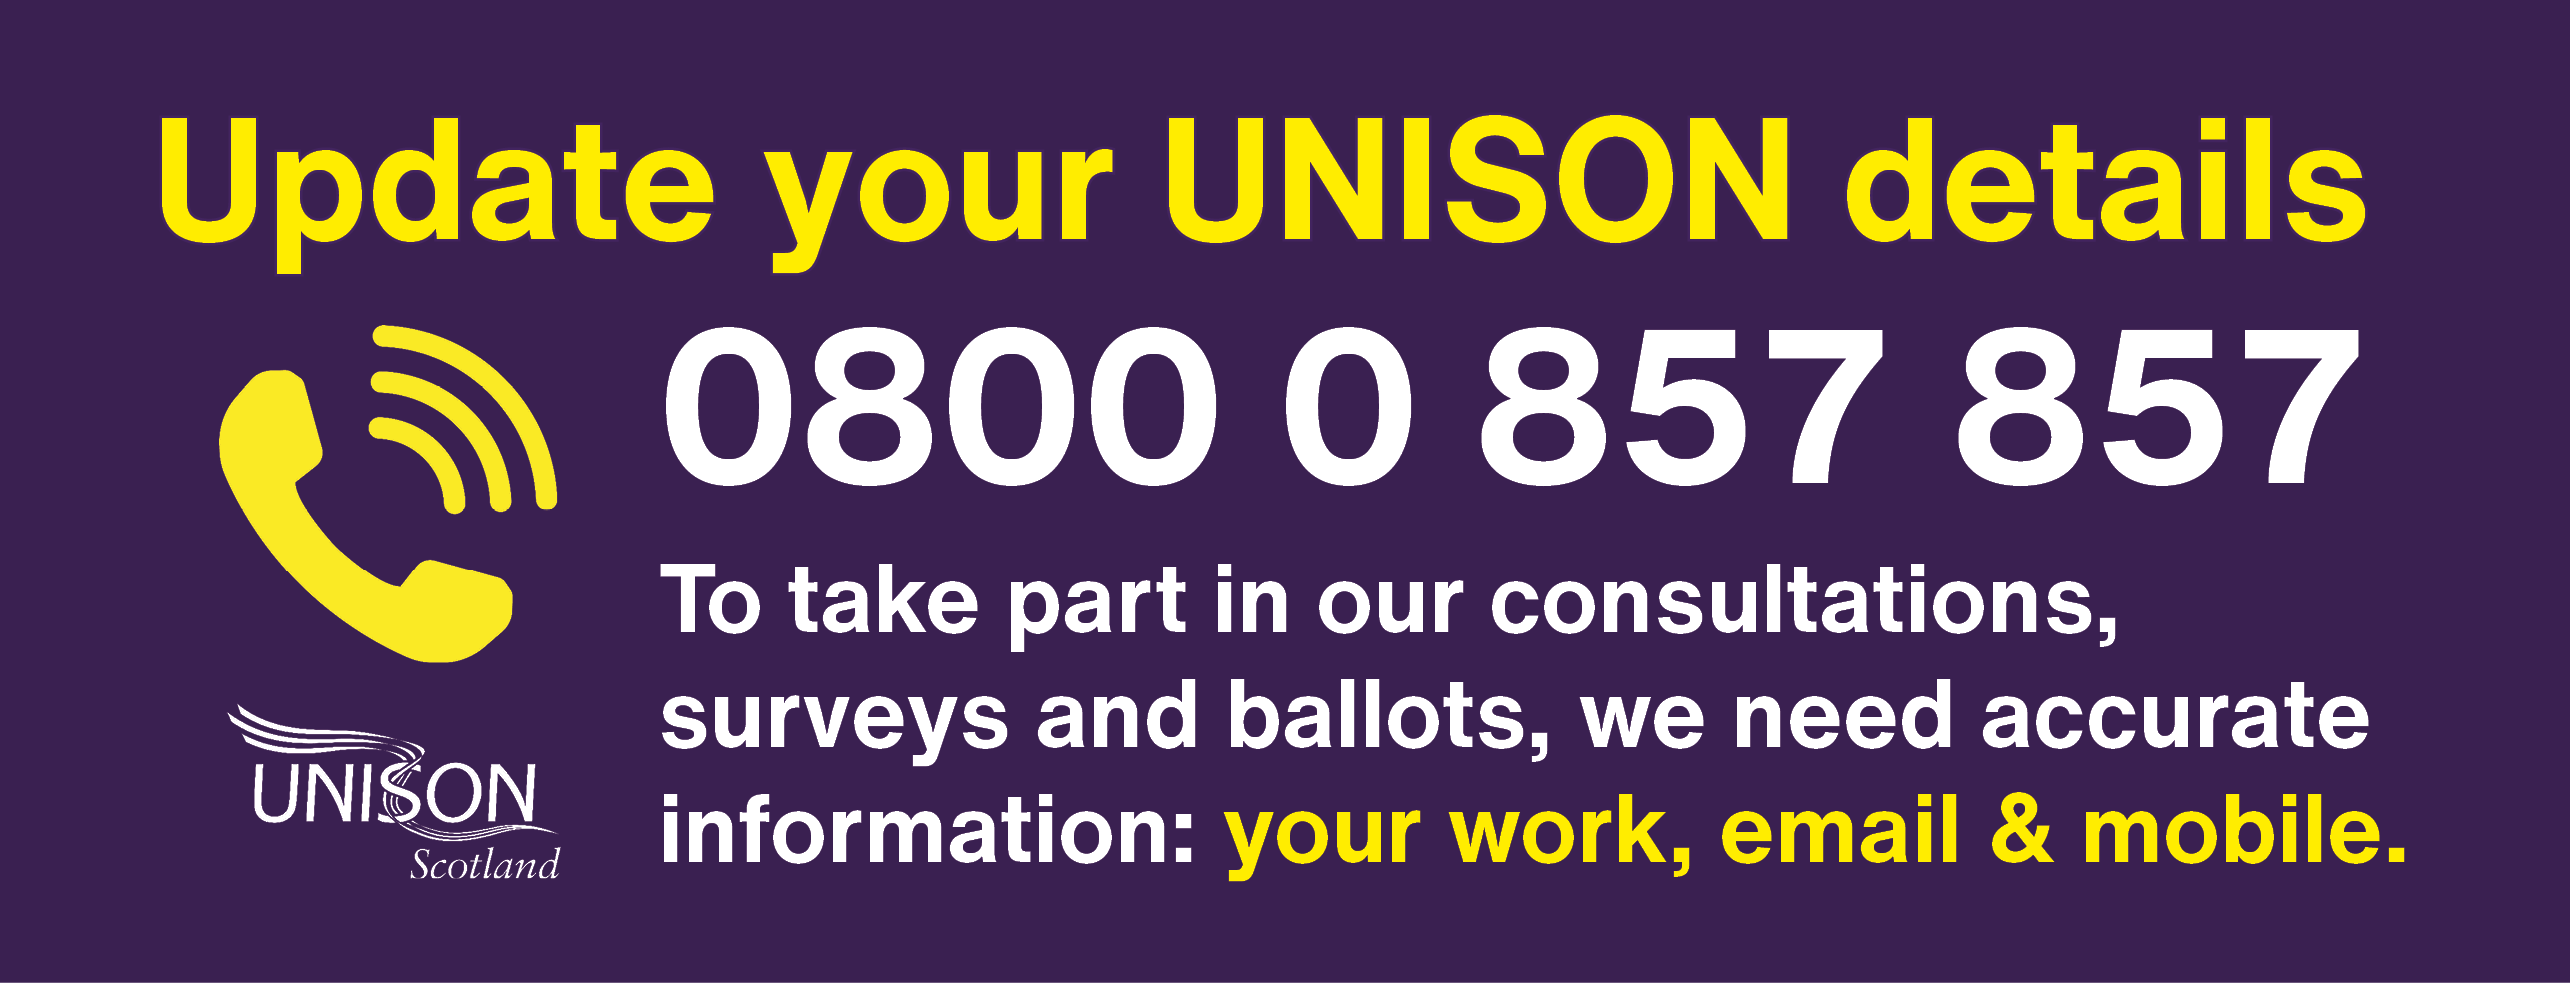 Update your details UNISON direct slider